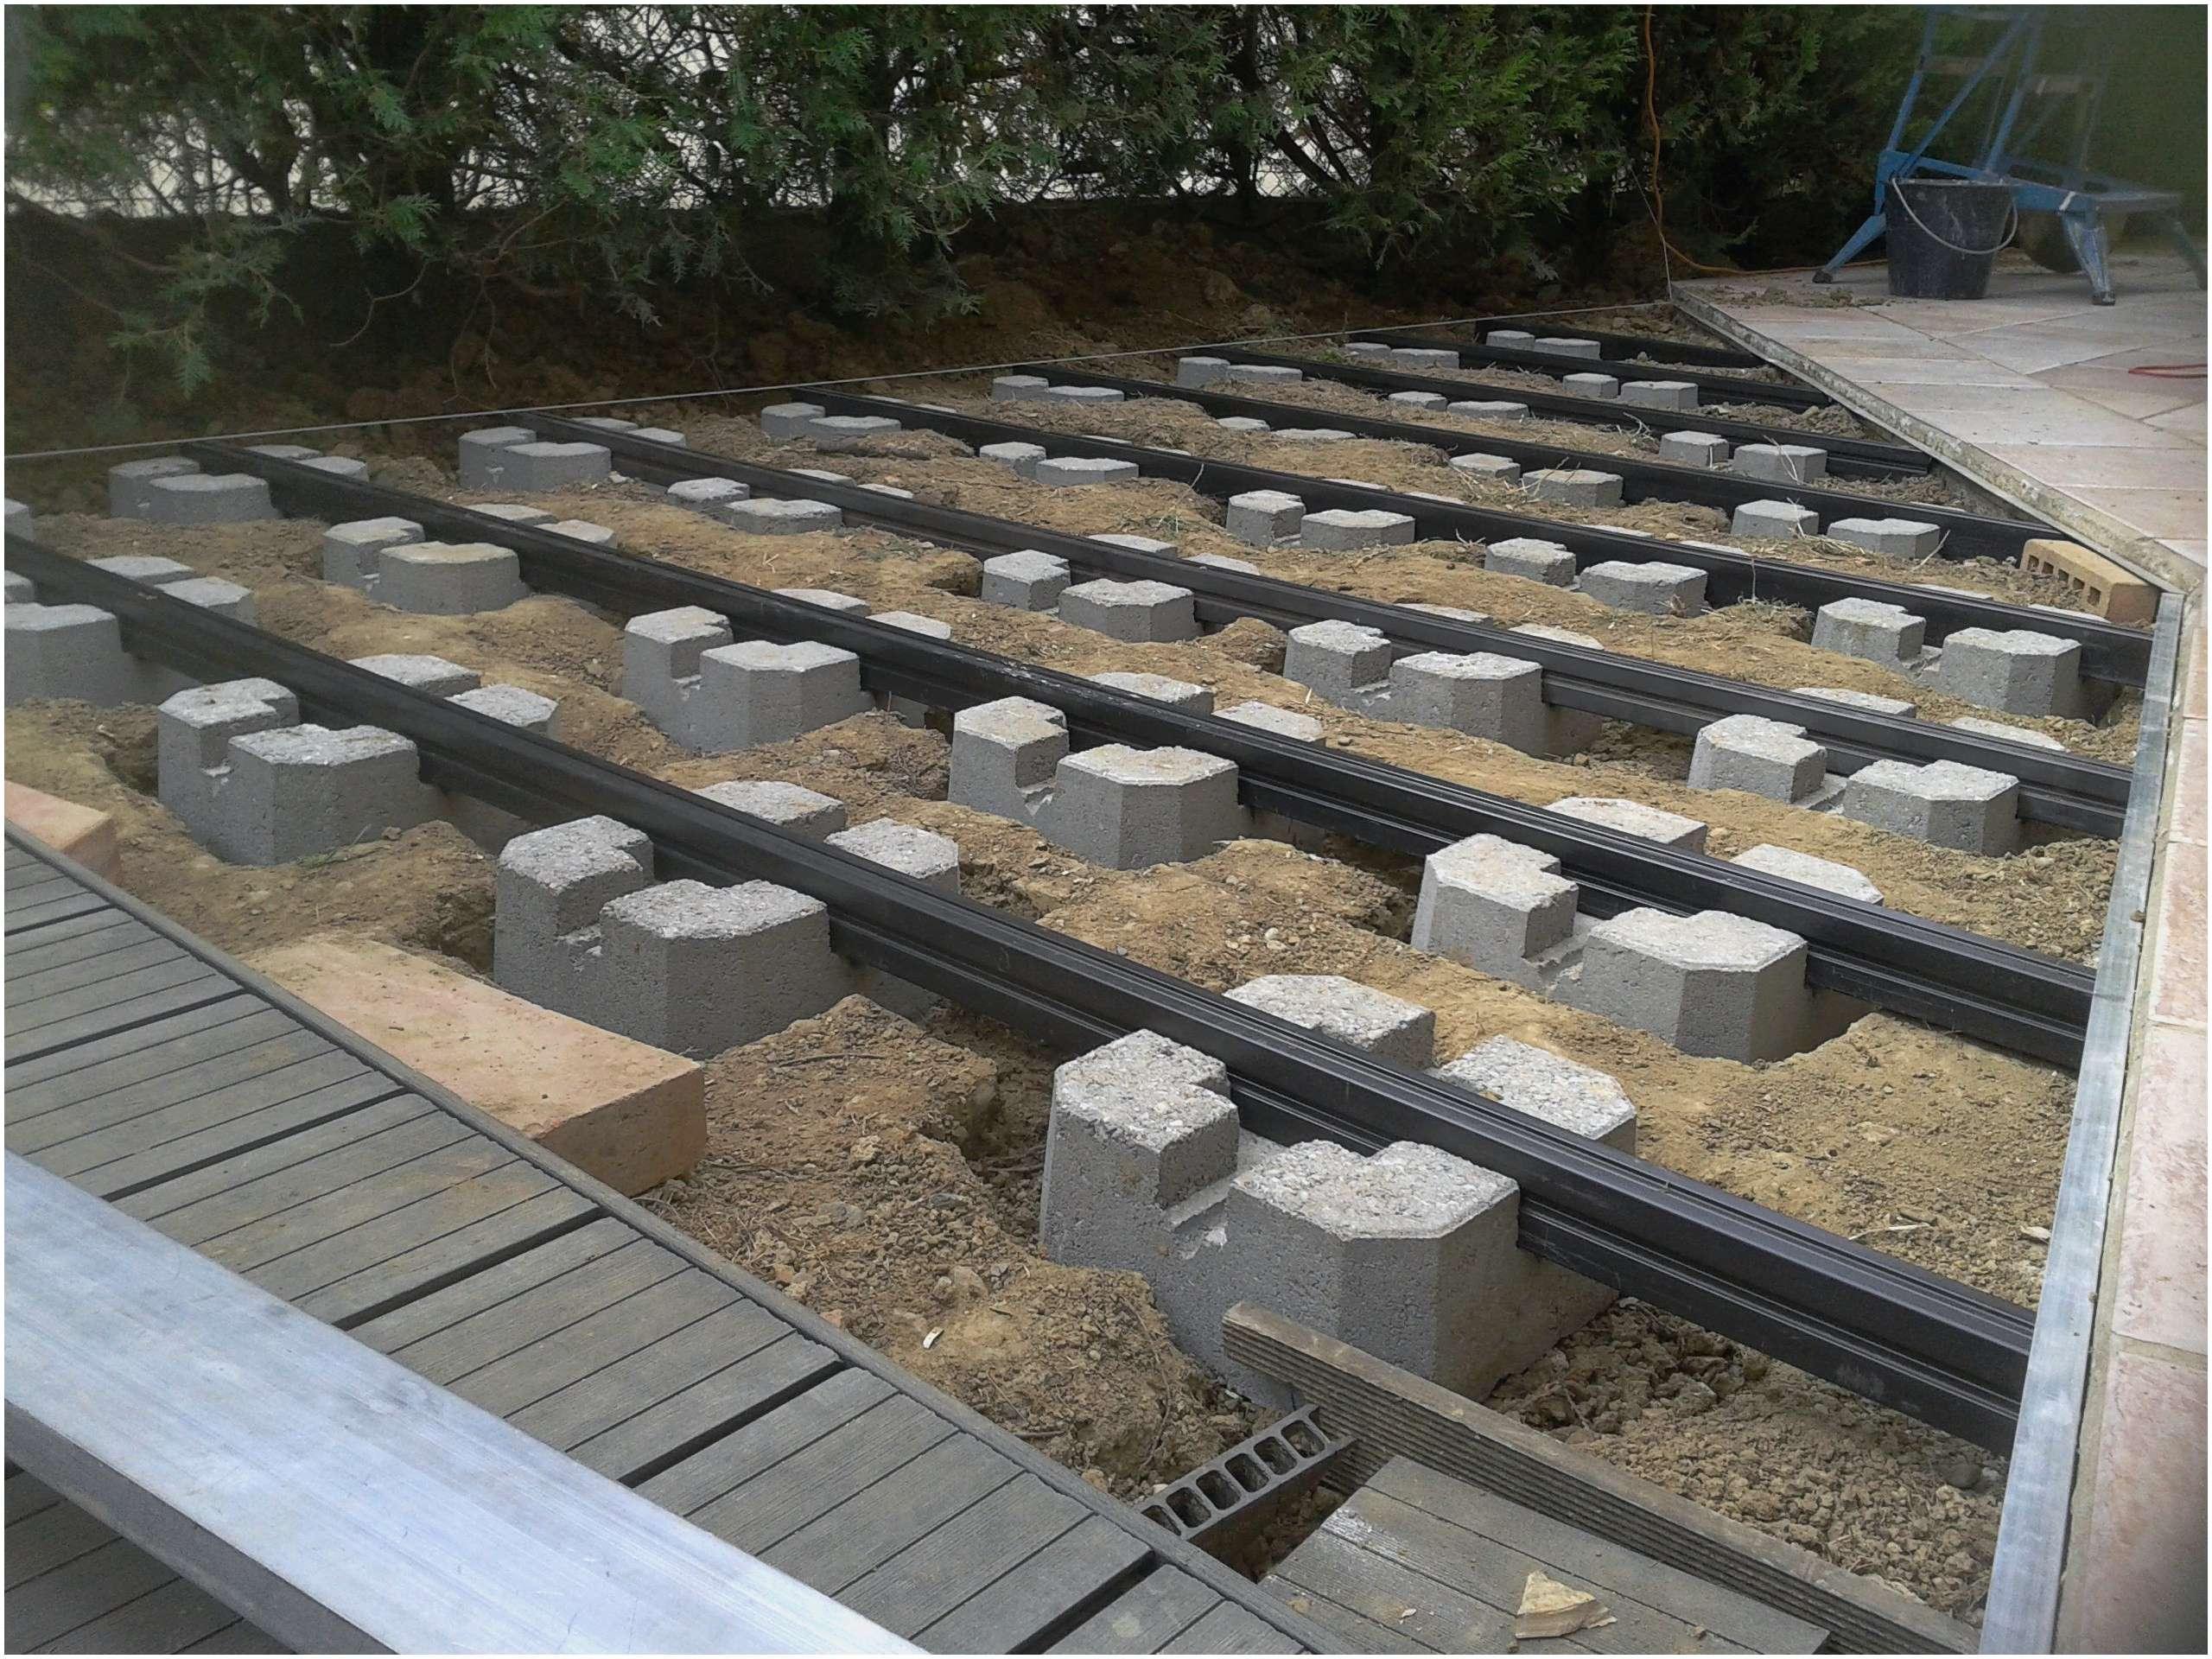 Lambourde Bois Brico Depot Gamboahinestrosa Tout Plot En Beton Pour Terrasse Leroy Merlin Idees Conception Jardin Idees Conception Jardin